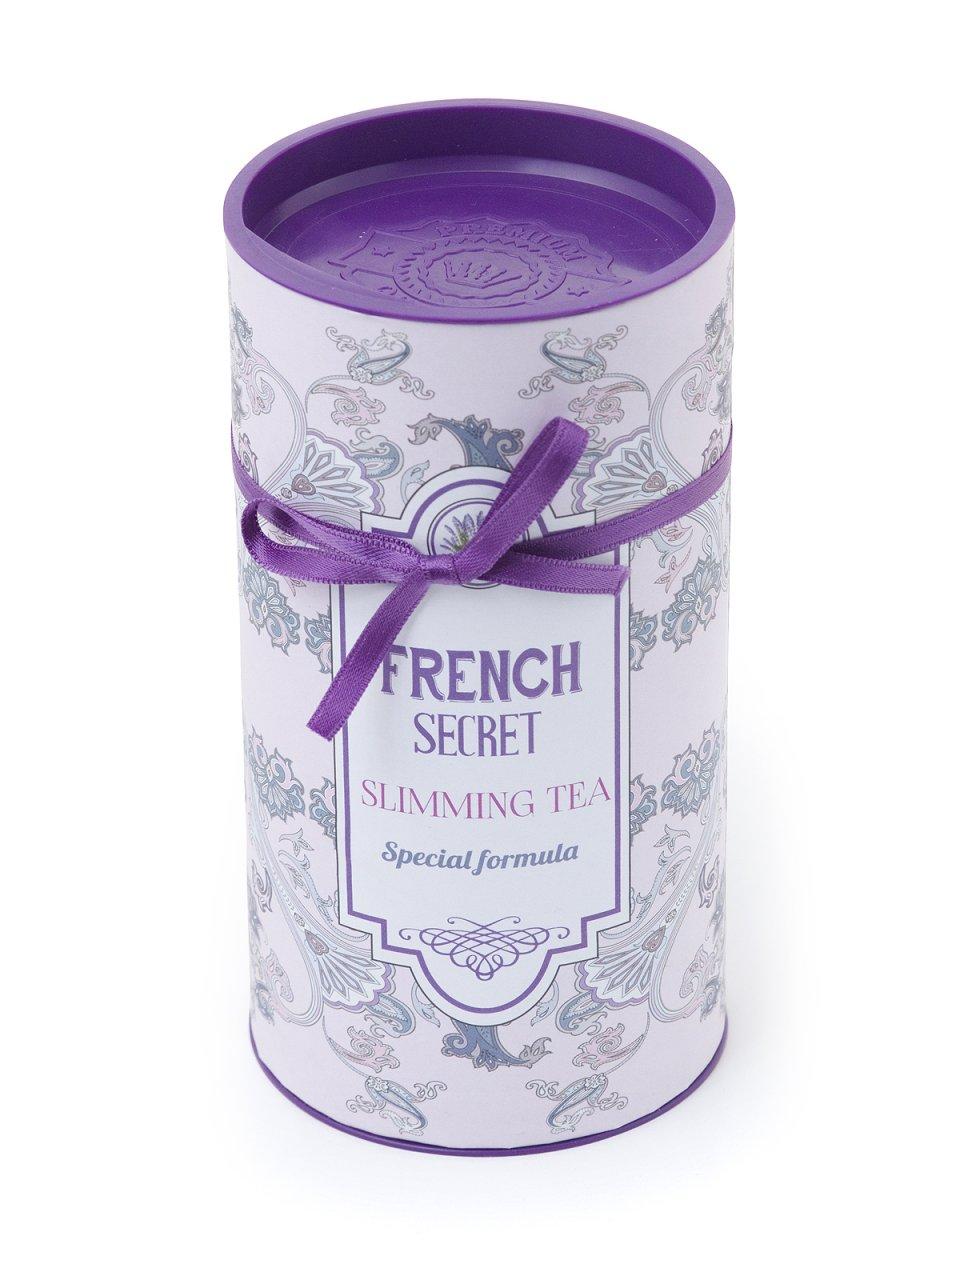 FRENCH SECRET TEA ЗА ПЛОСКО КОРЕМЧЕ (60 БР)